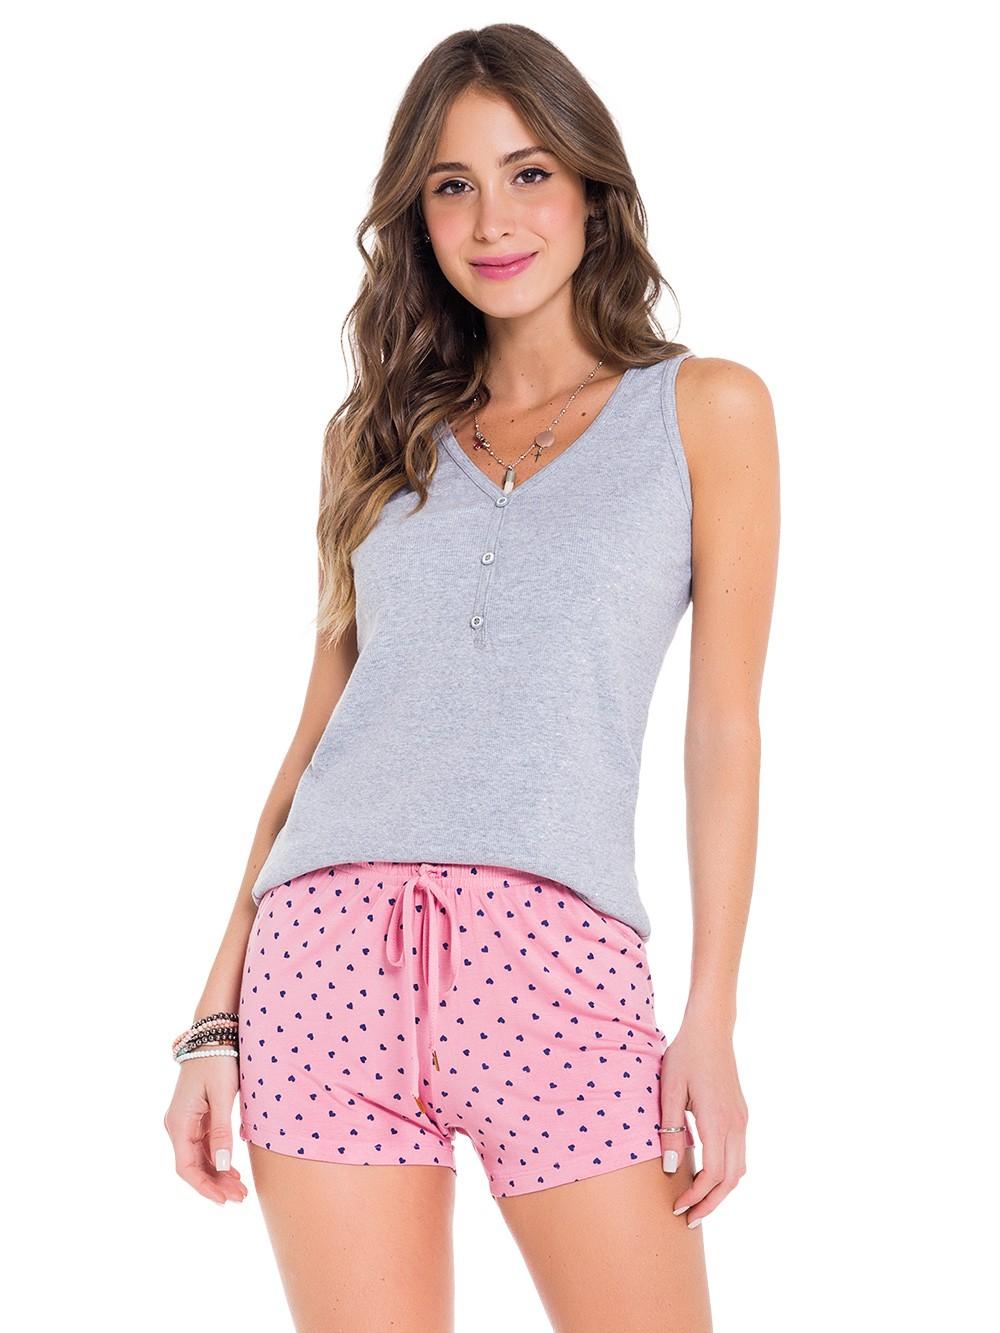 Pijama baby doll curto feminino regata c/ botão short poá